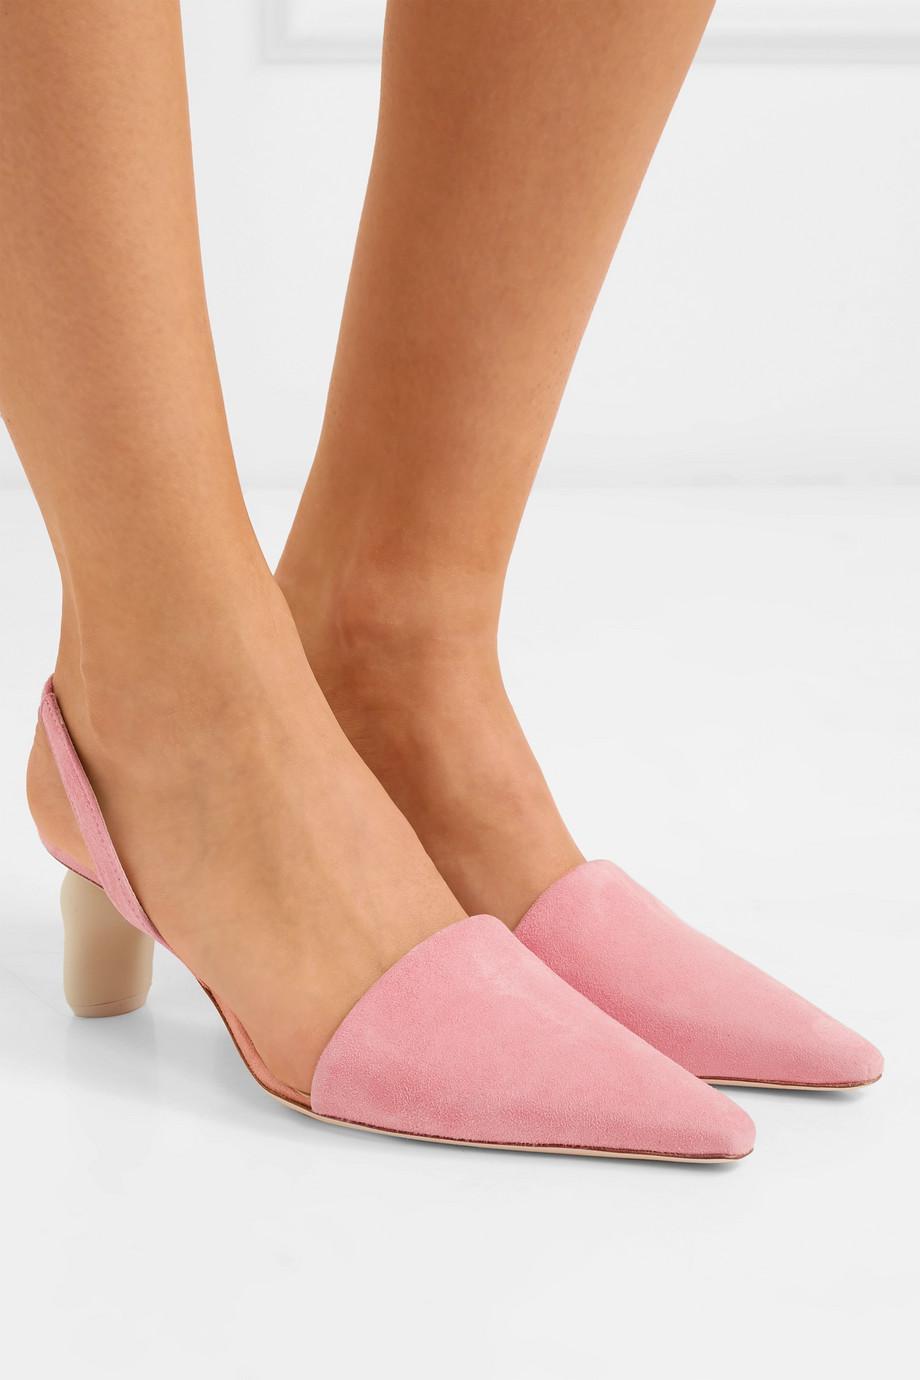 Conie Suede Slingback Pumps - Pink Rejina Pyo QvcTI4Oo